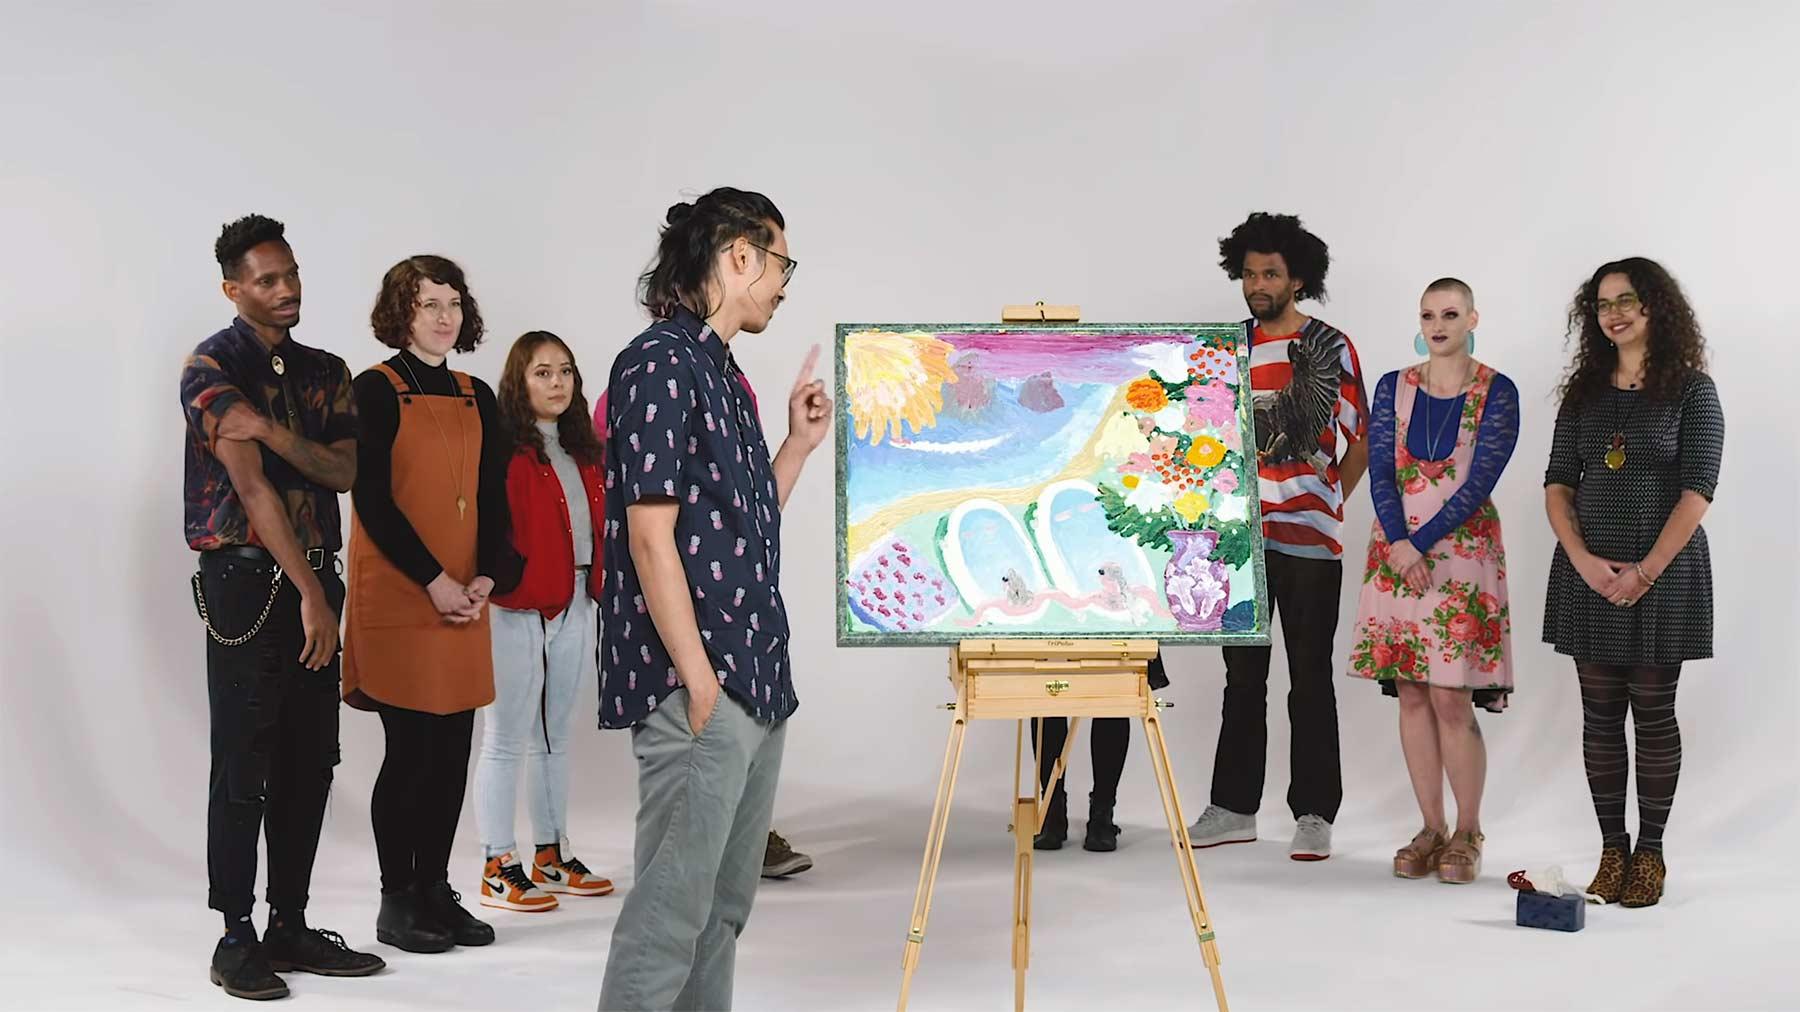 Leute ordnen Kunstwerke fremden Personen zu kunst-kuenstler-zuordnen